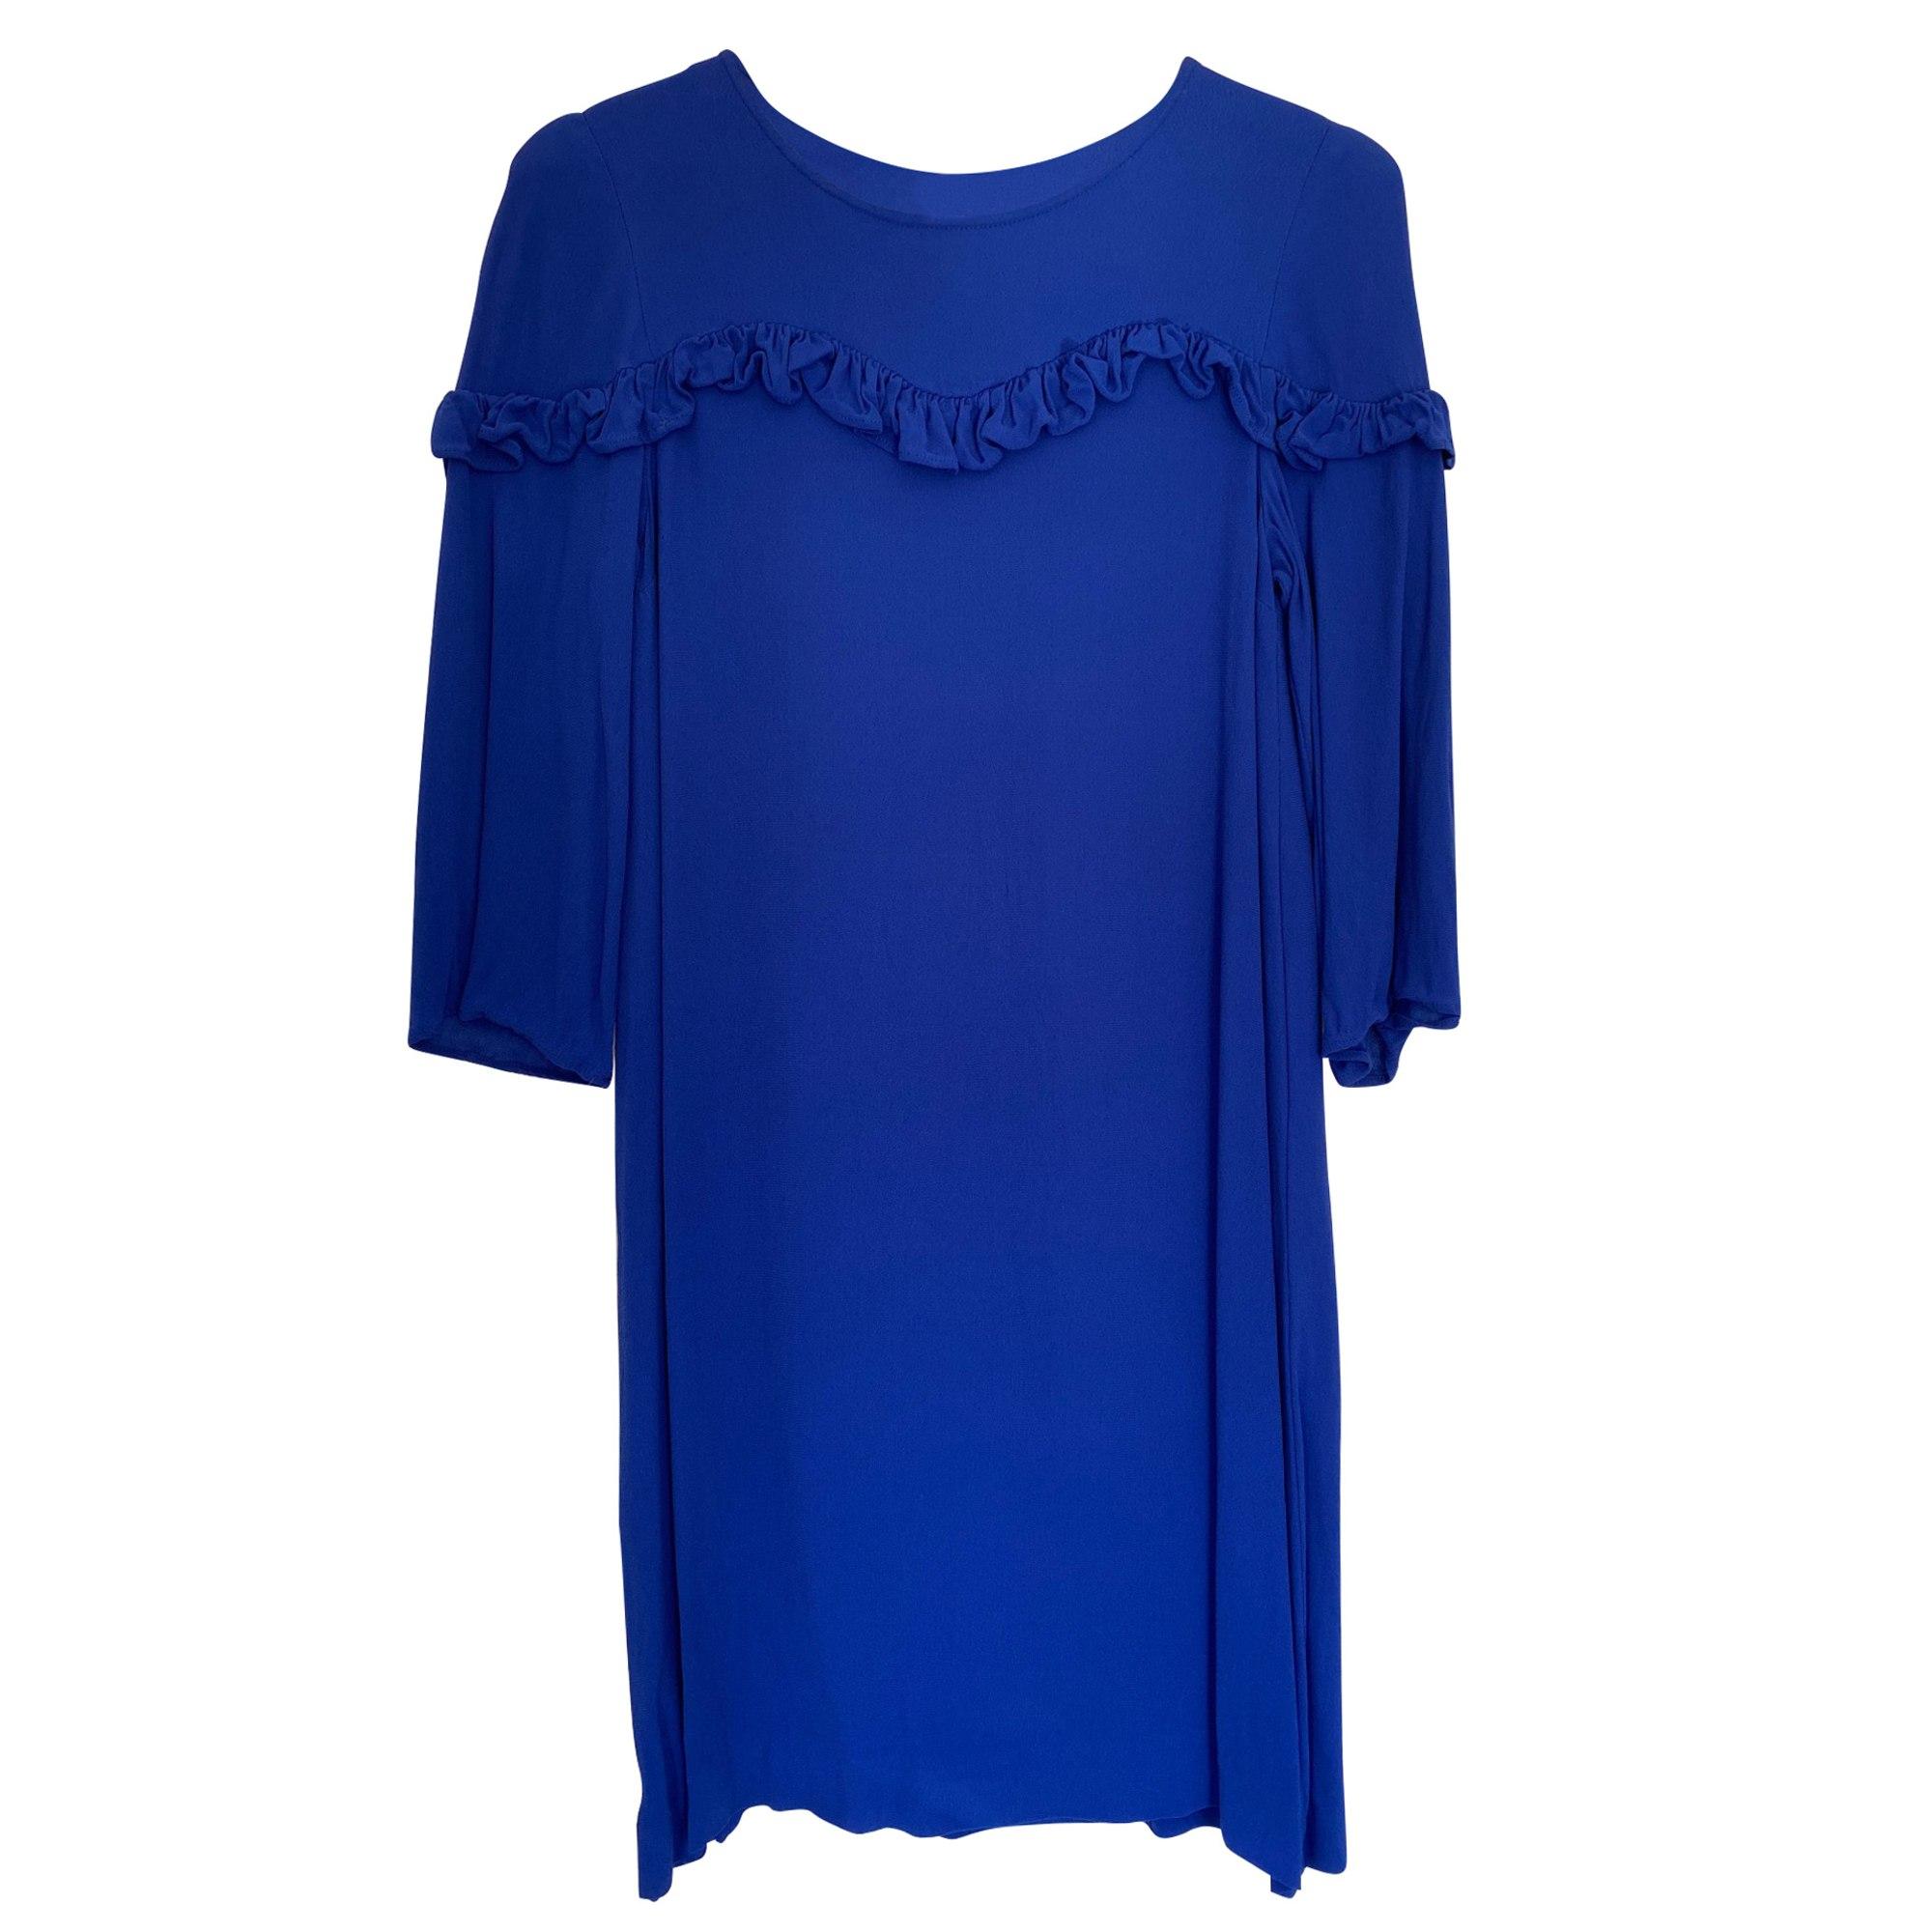 Mini Dress CLAUDIE PIERLOT Blue, navy, turquoise